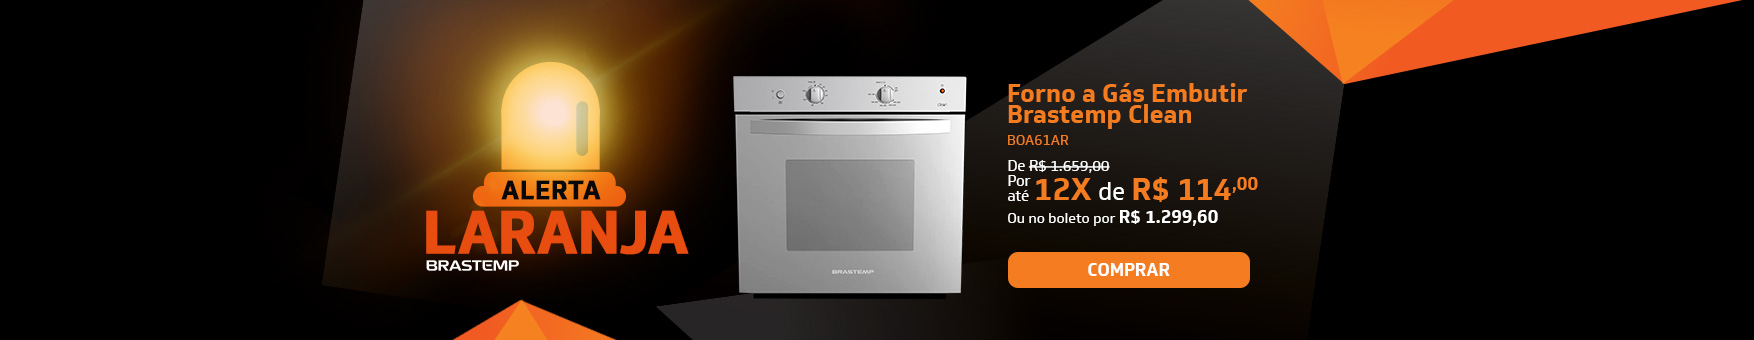 Promoção Interna - 138 - alertalaranja_boa61ar_home_27072015 - boa61ar - 2